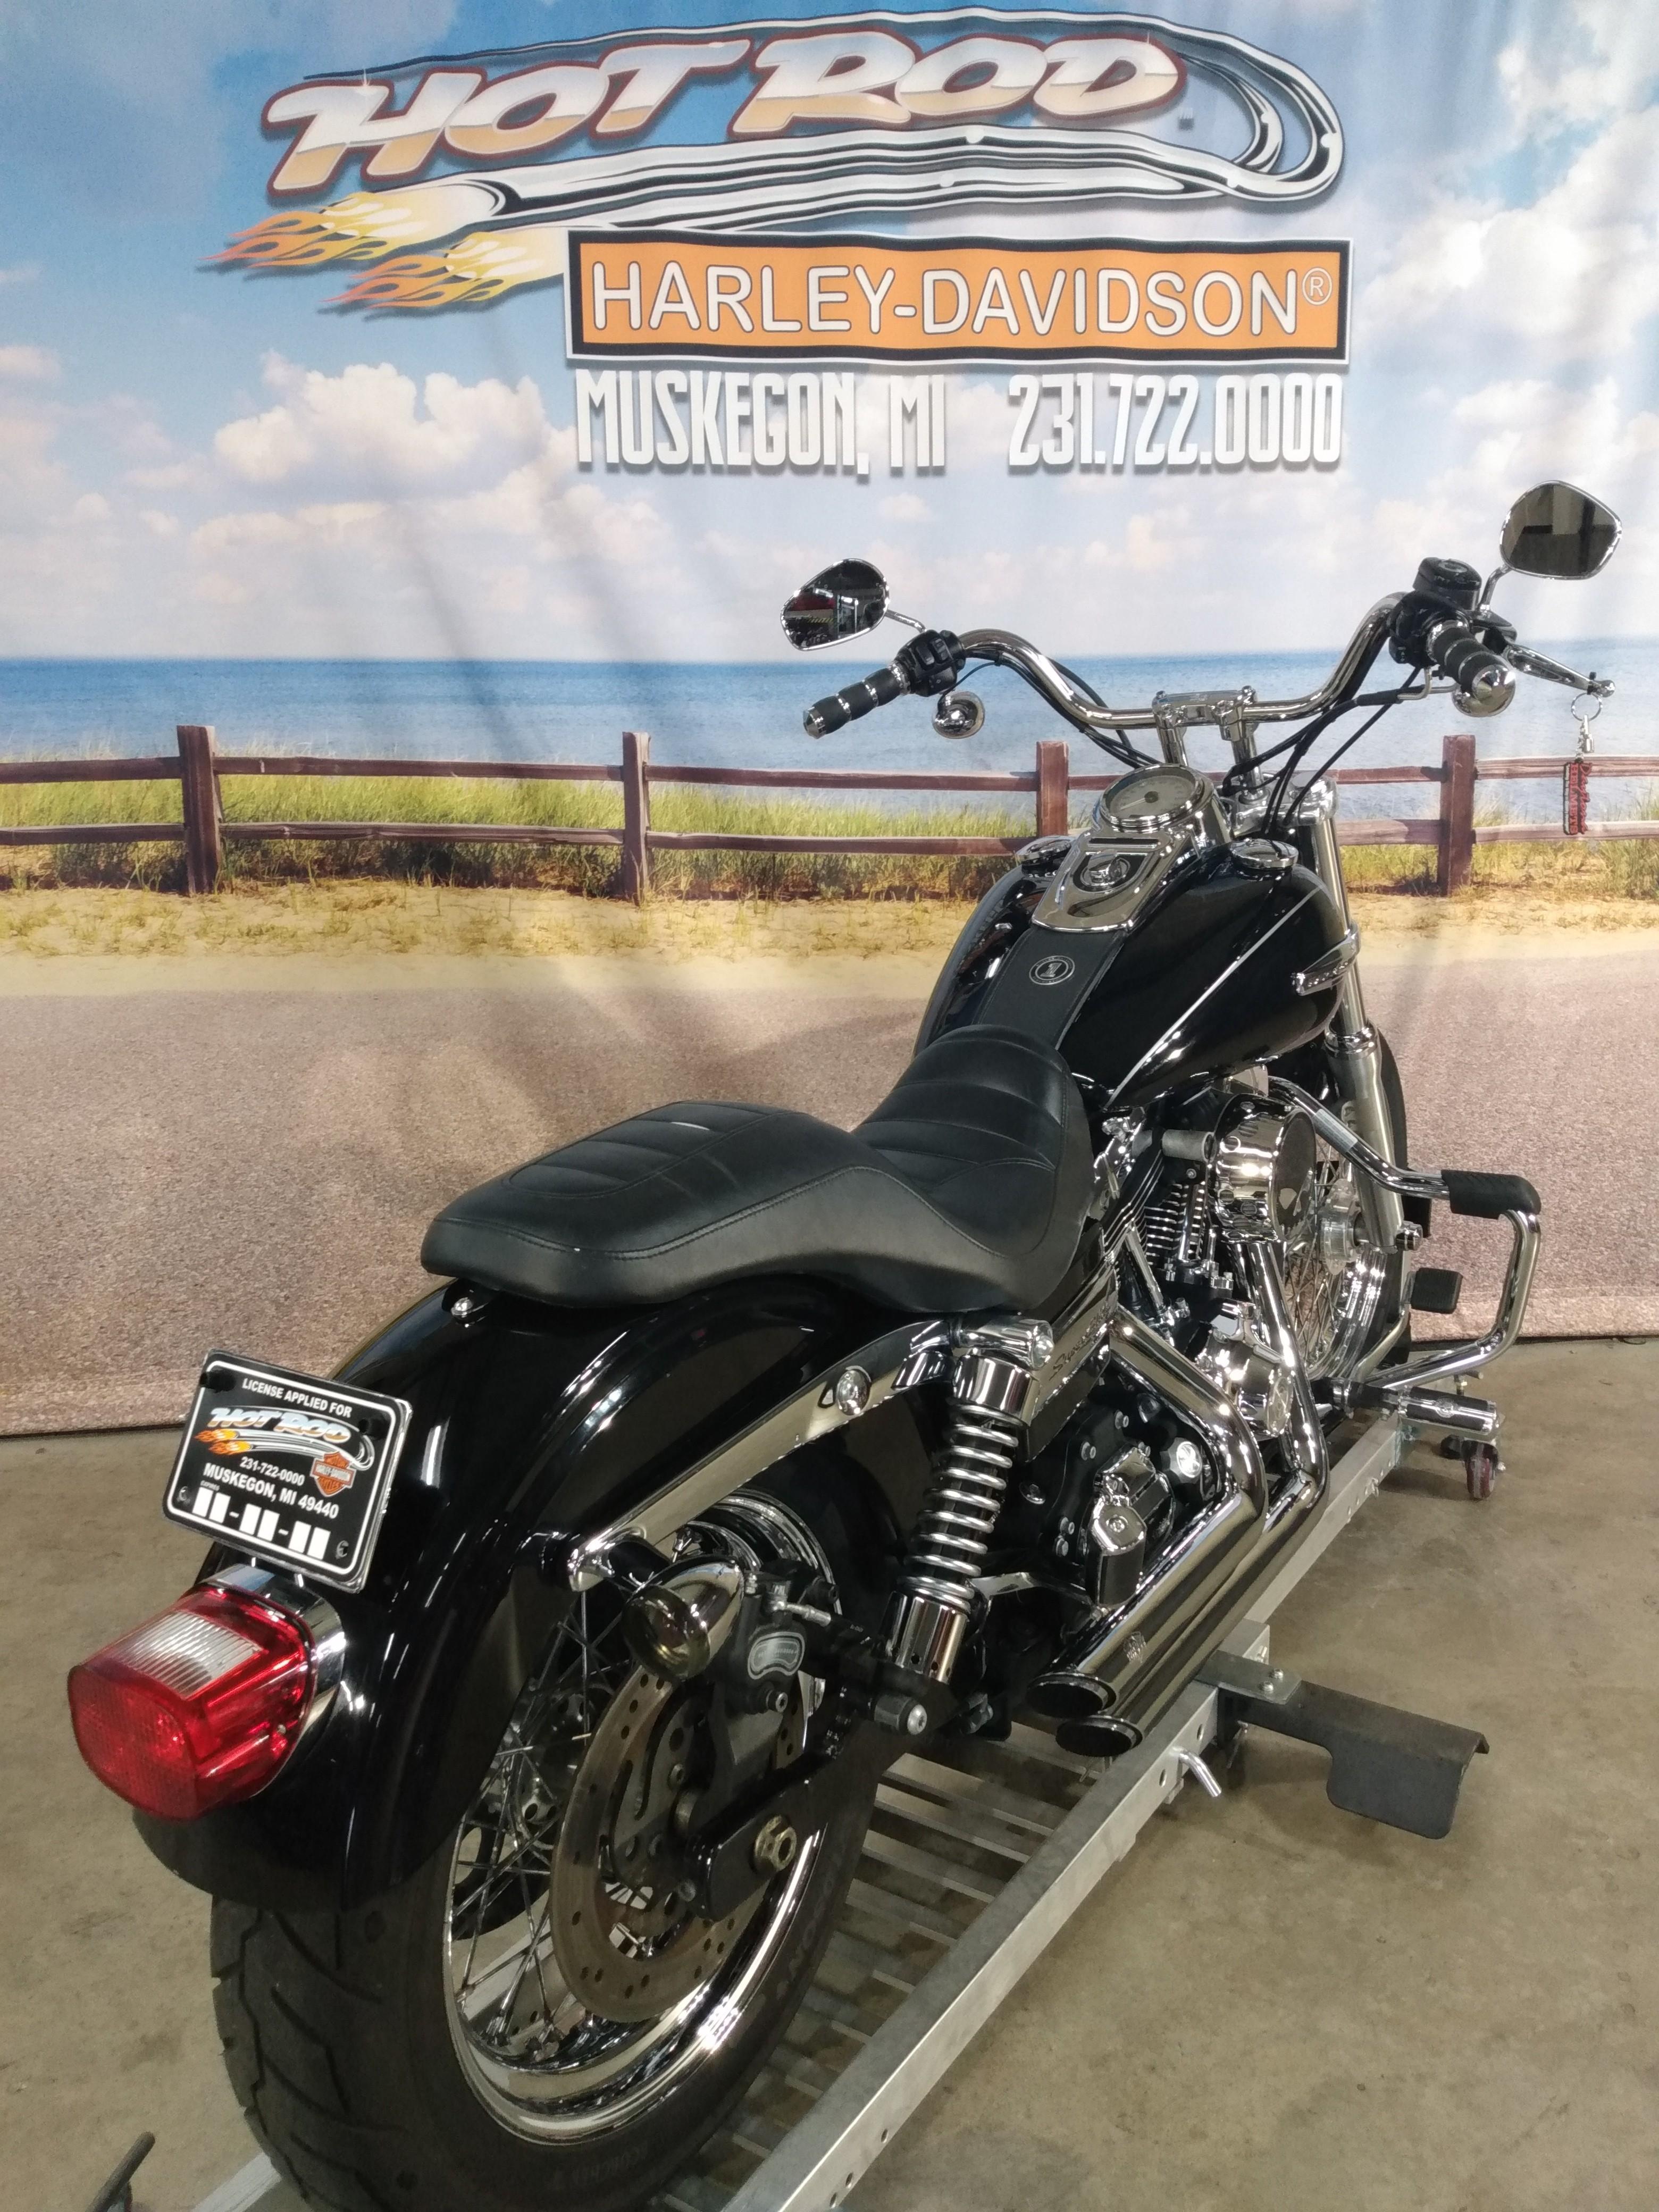 2010 Harley-Davidson FXDC at Hot Rod Harley-Davidson